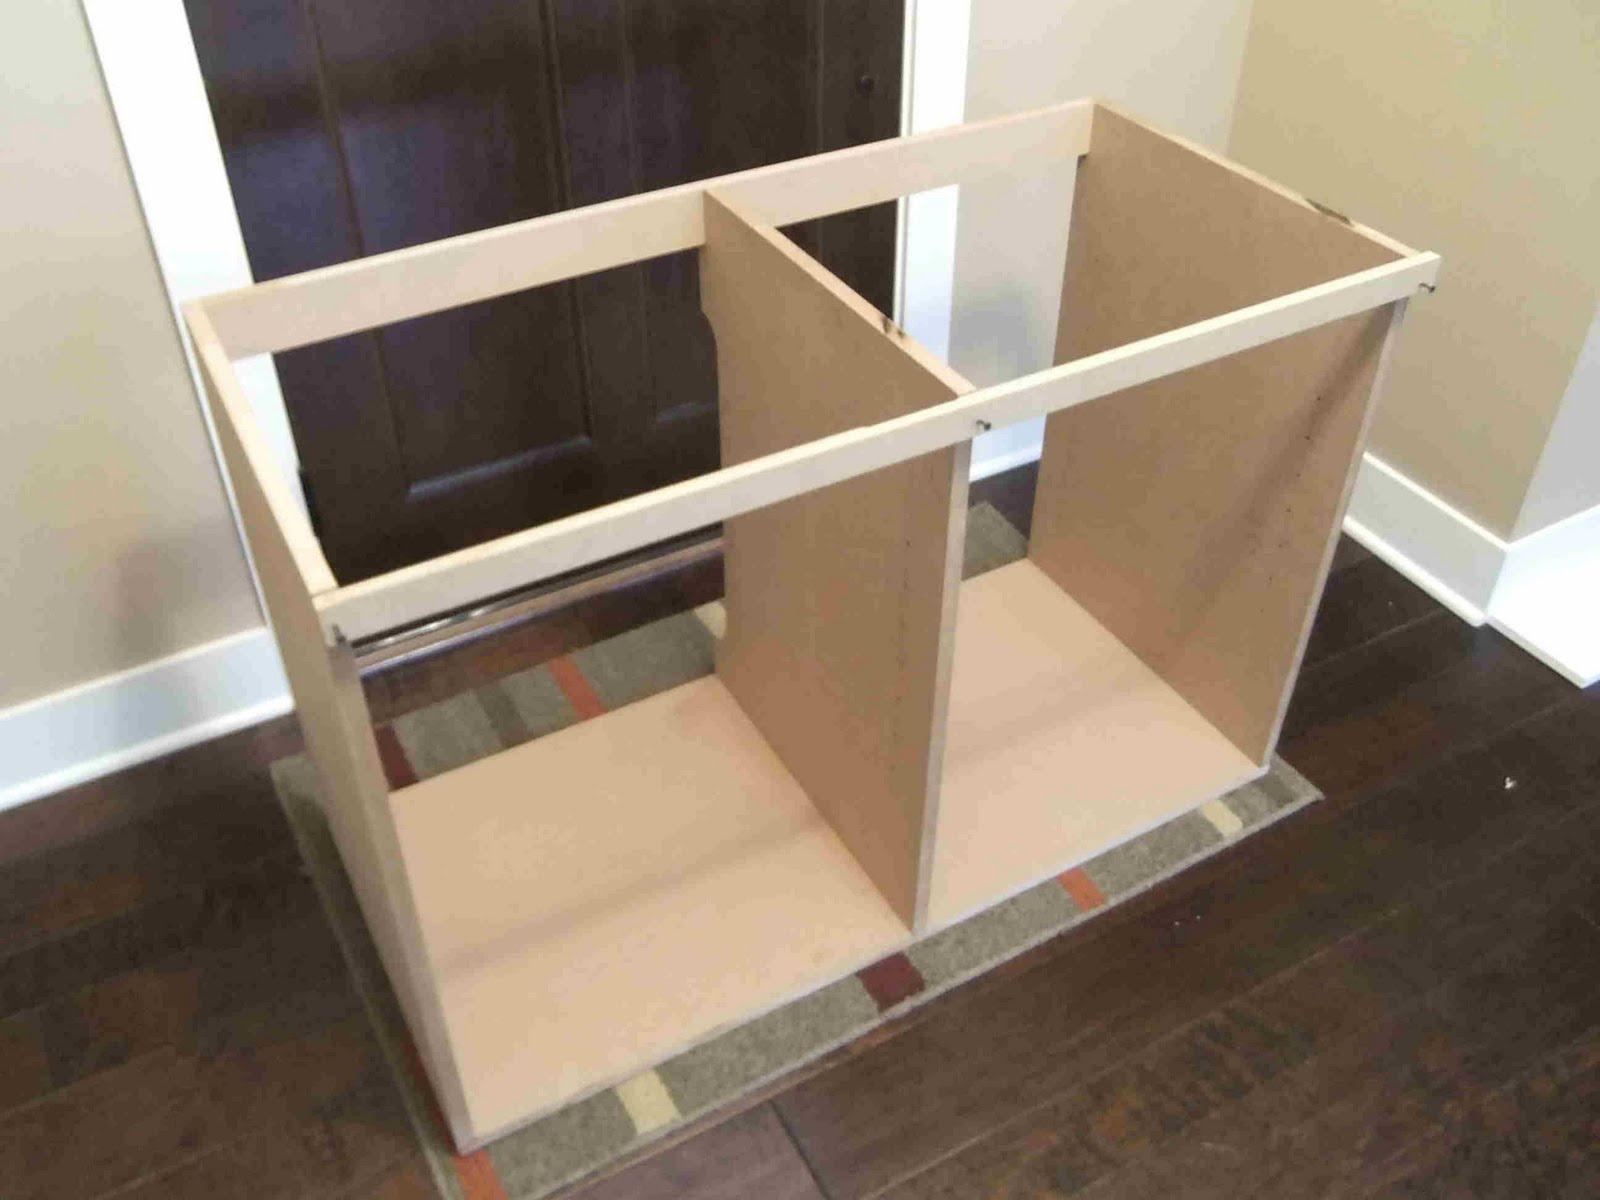 نحوه ساخت کابینت